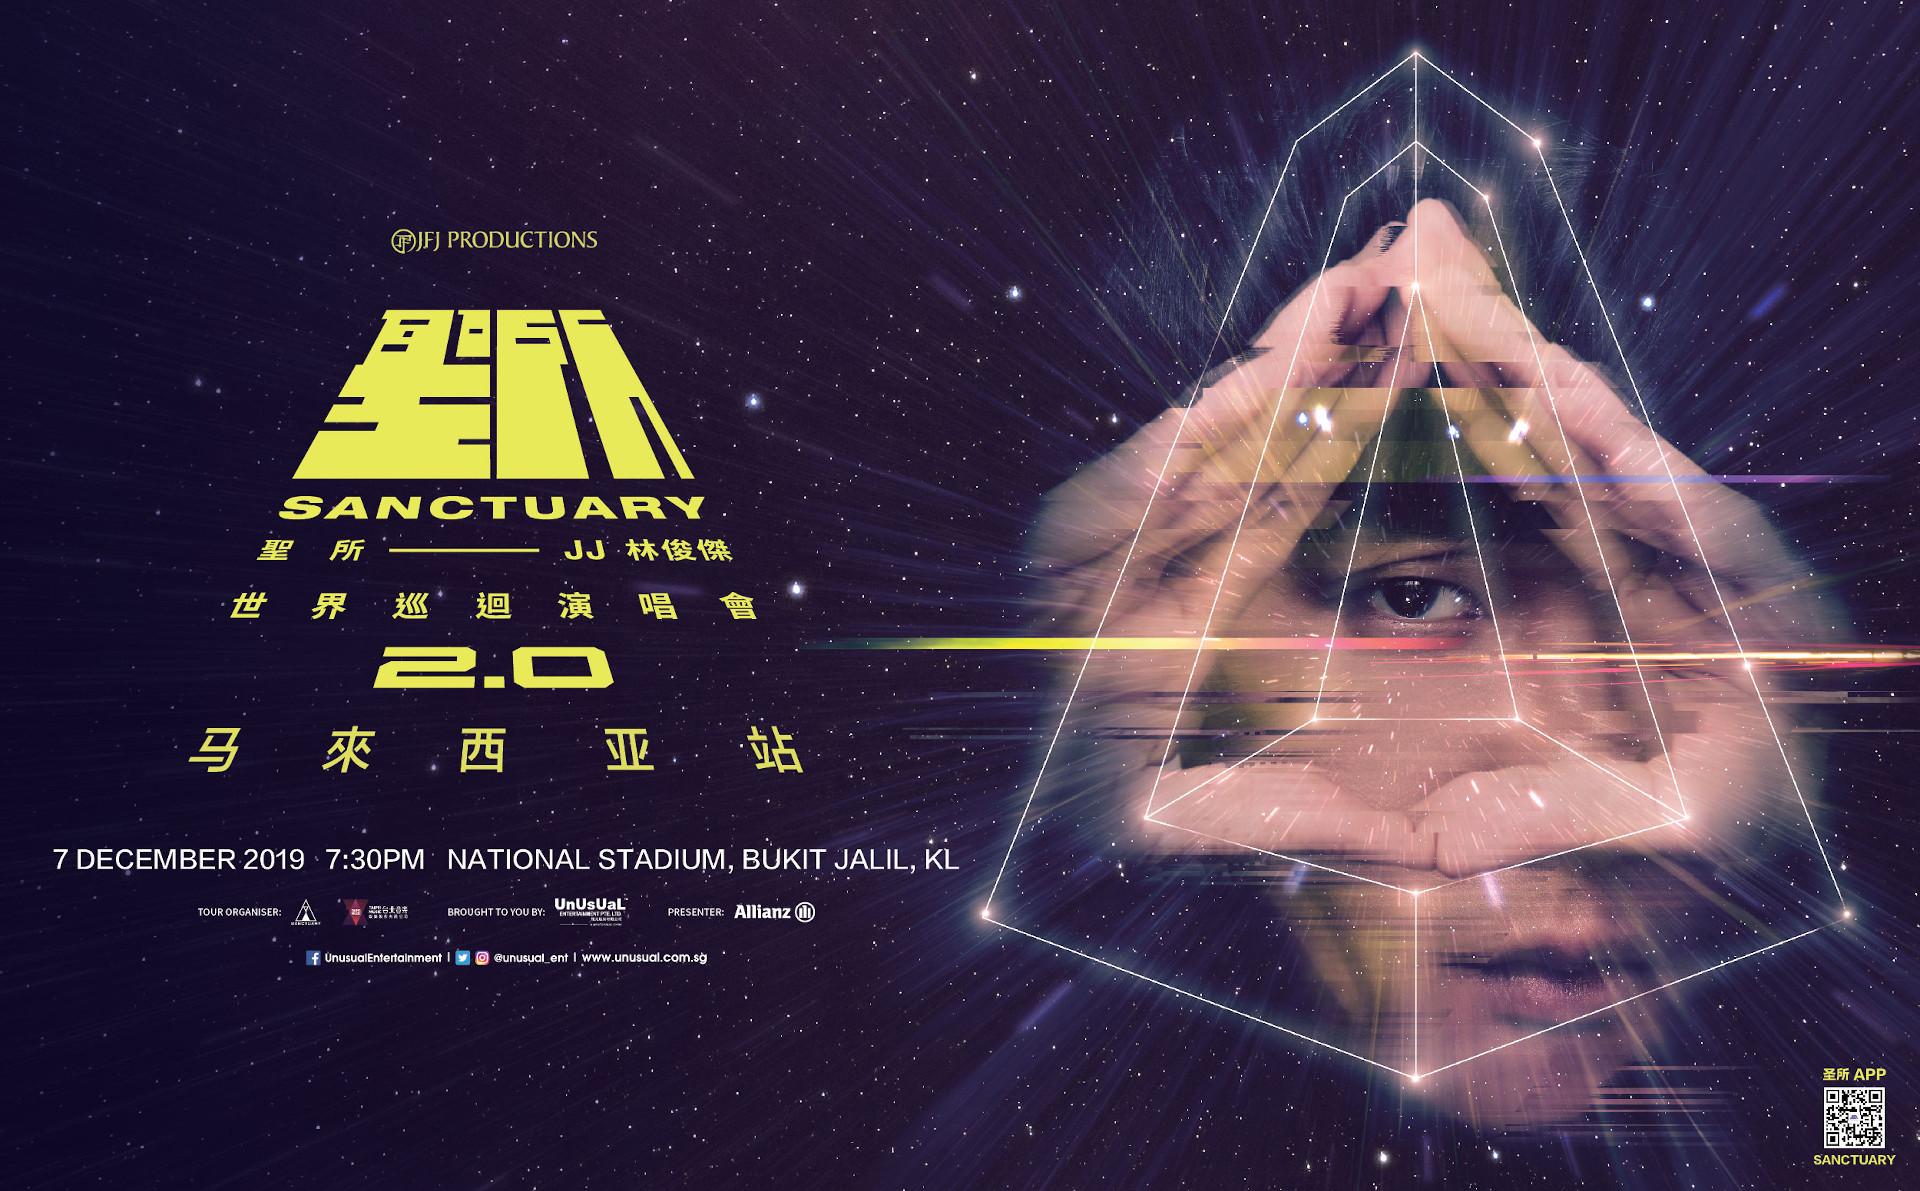 JJ Lin Live In KL, Sanctuary 2.0 World Tour Malaysia 2019